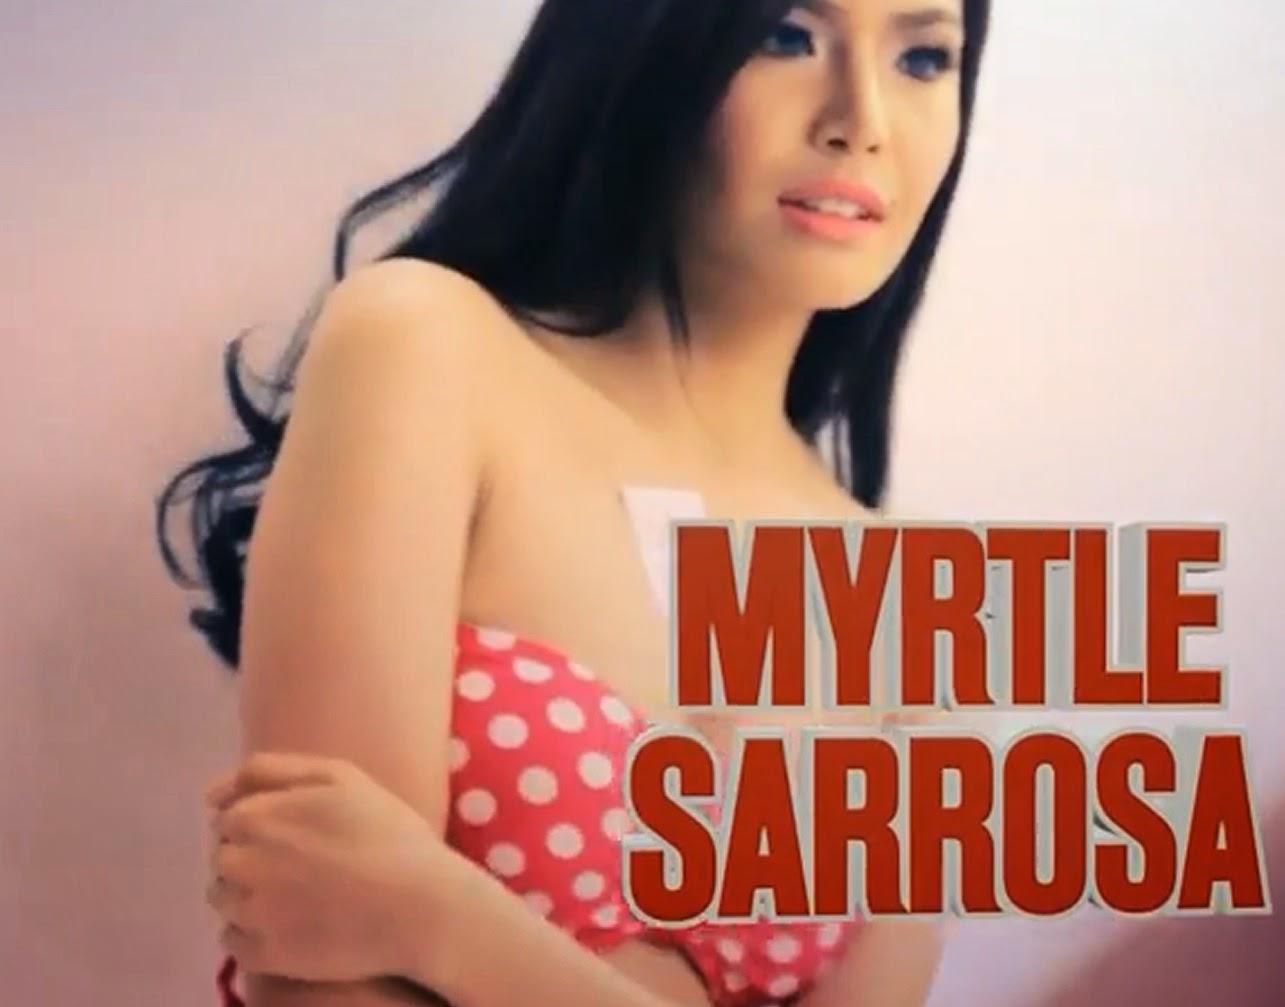 MYRTLE SARROSA 3